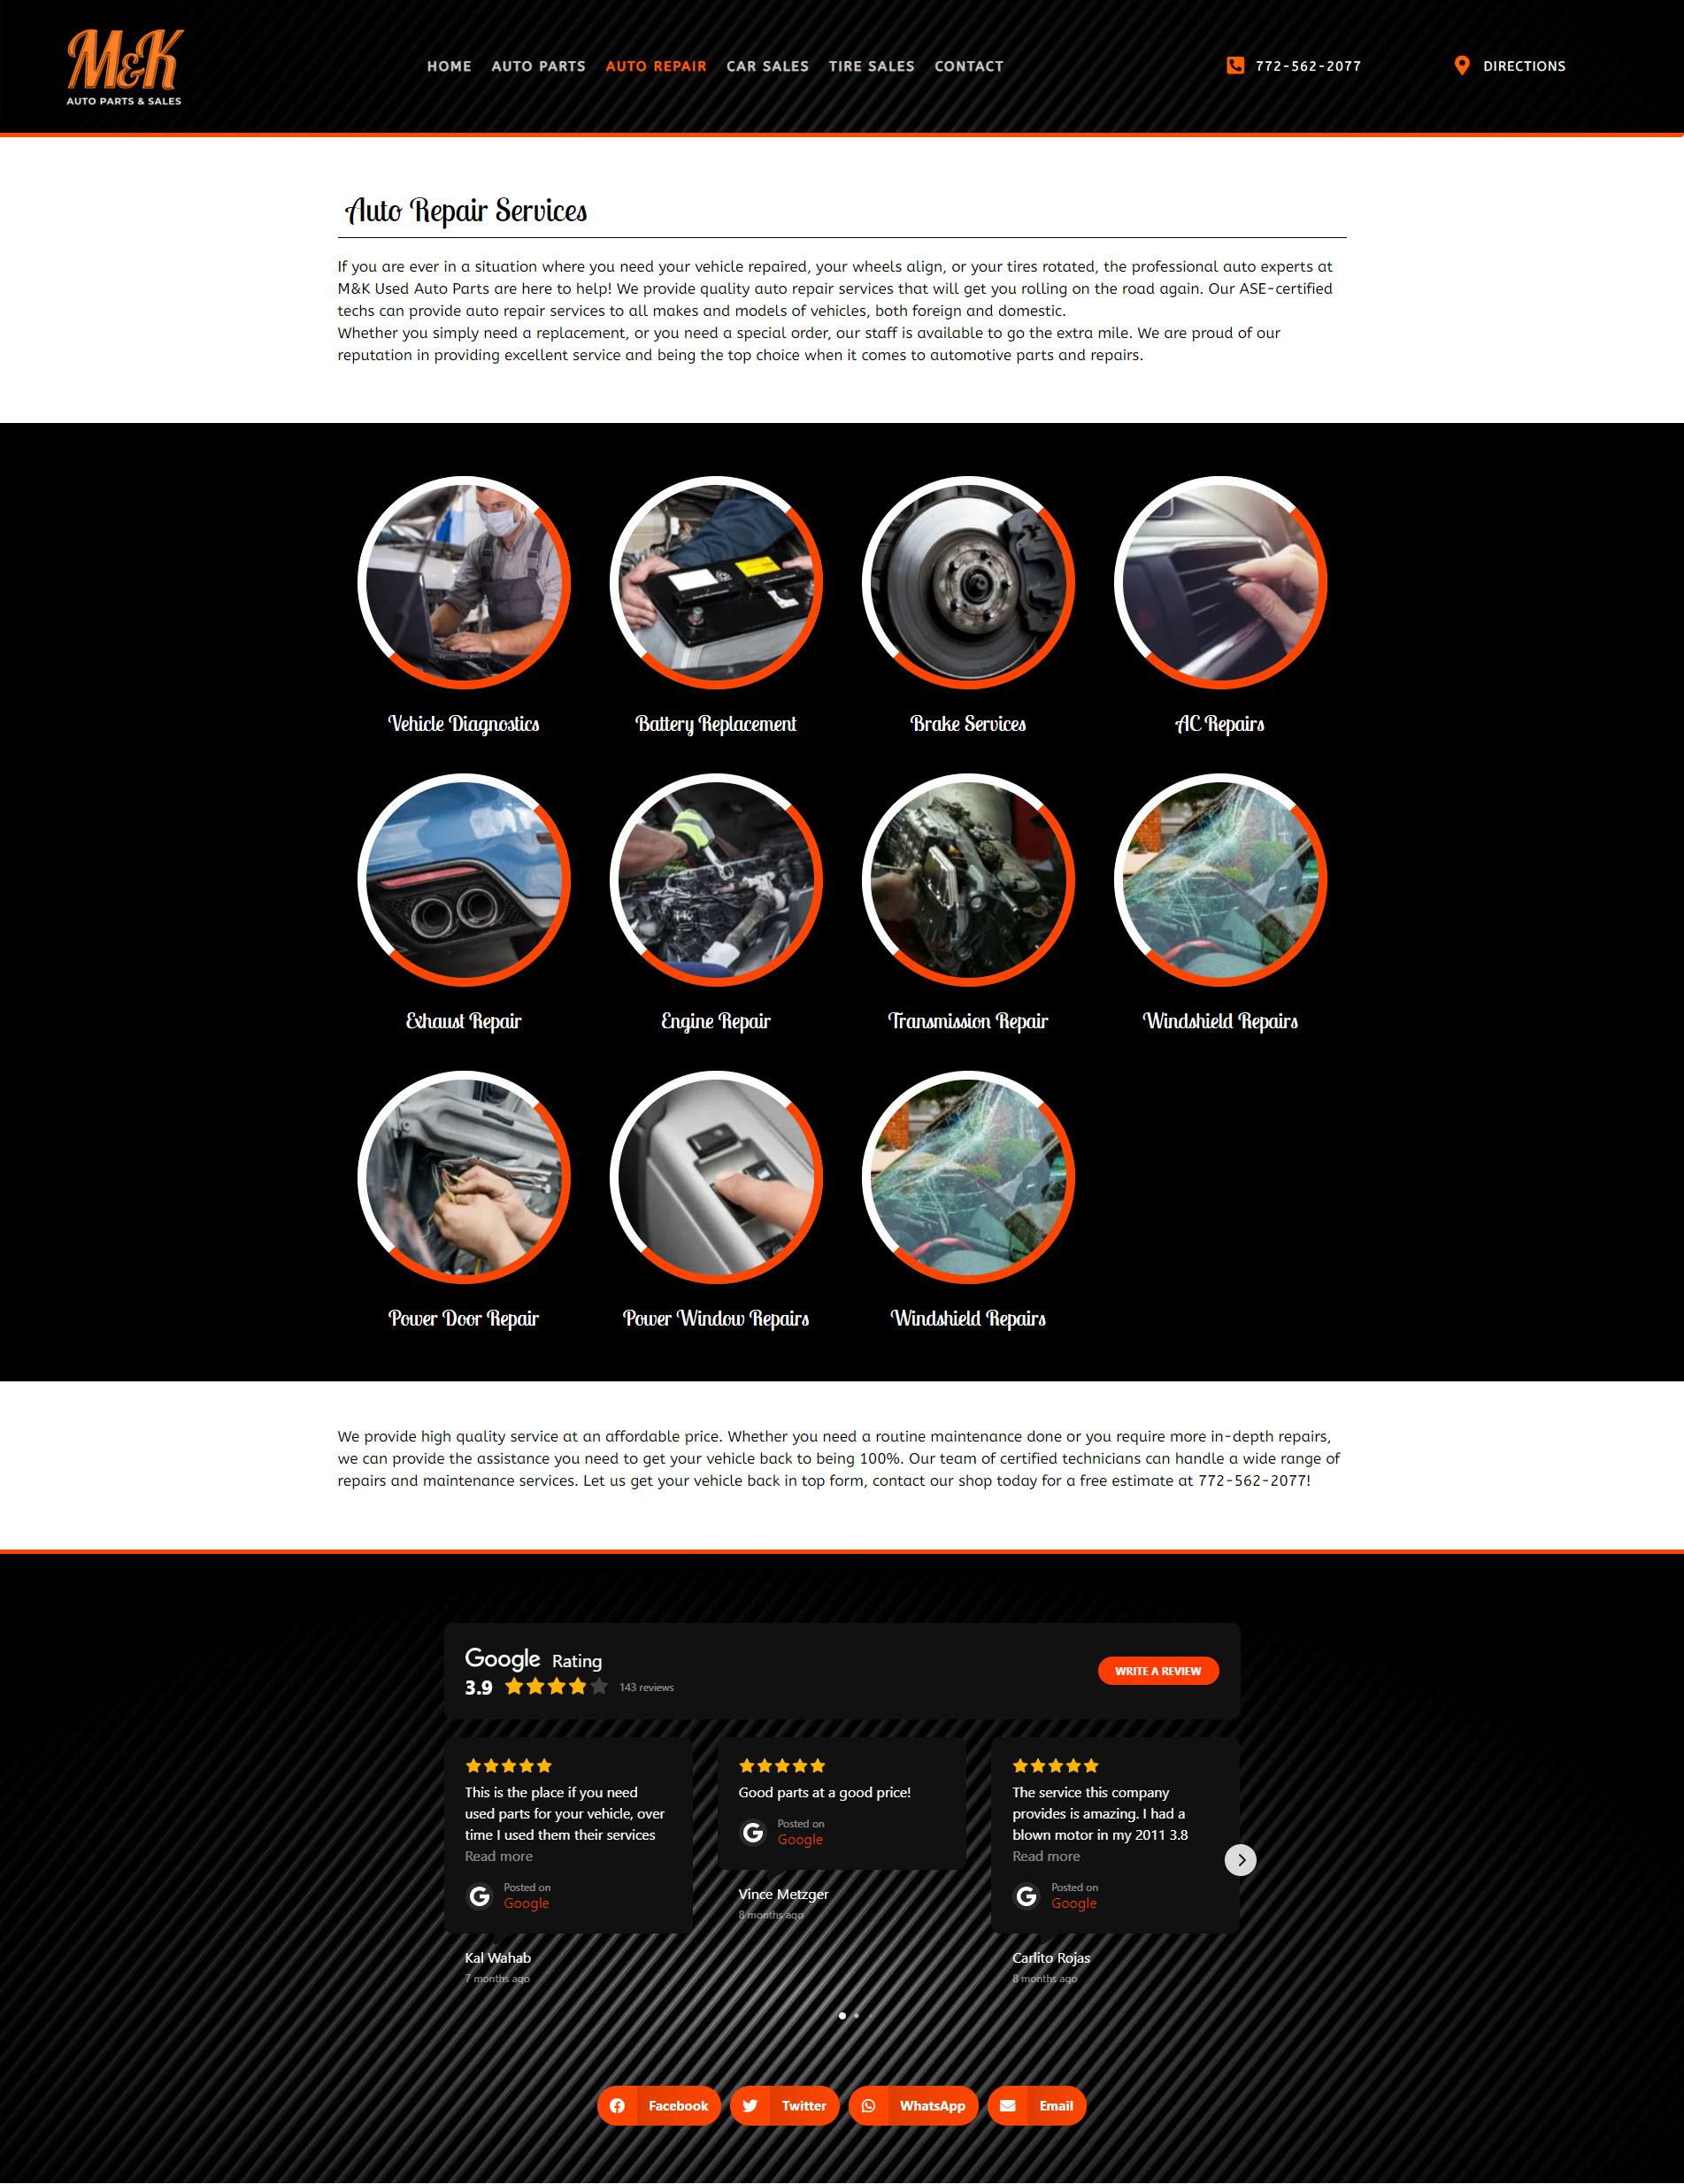 Design & Marketing For a Local Auto Parts & Repairs Company 5